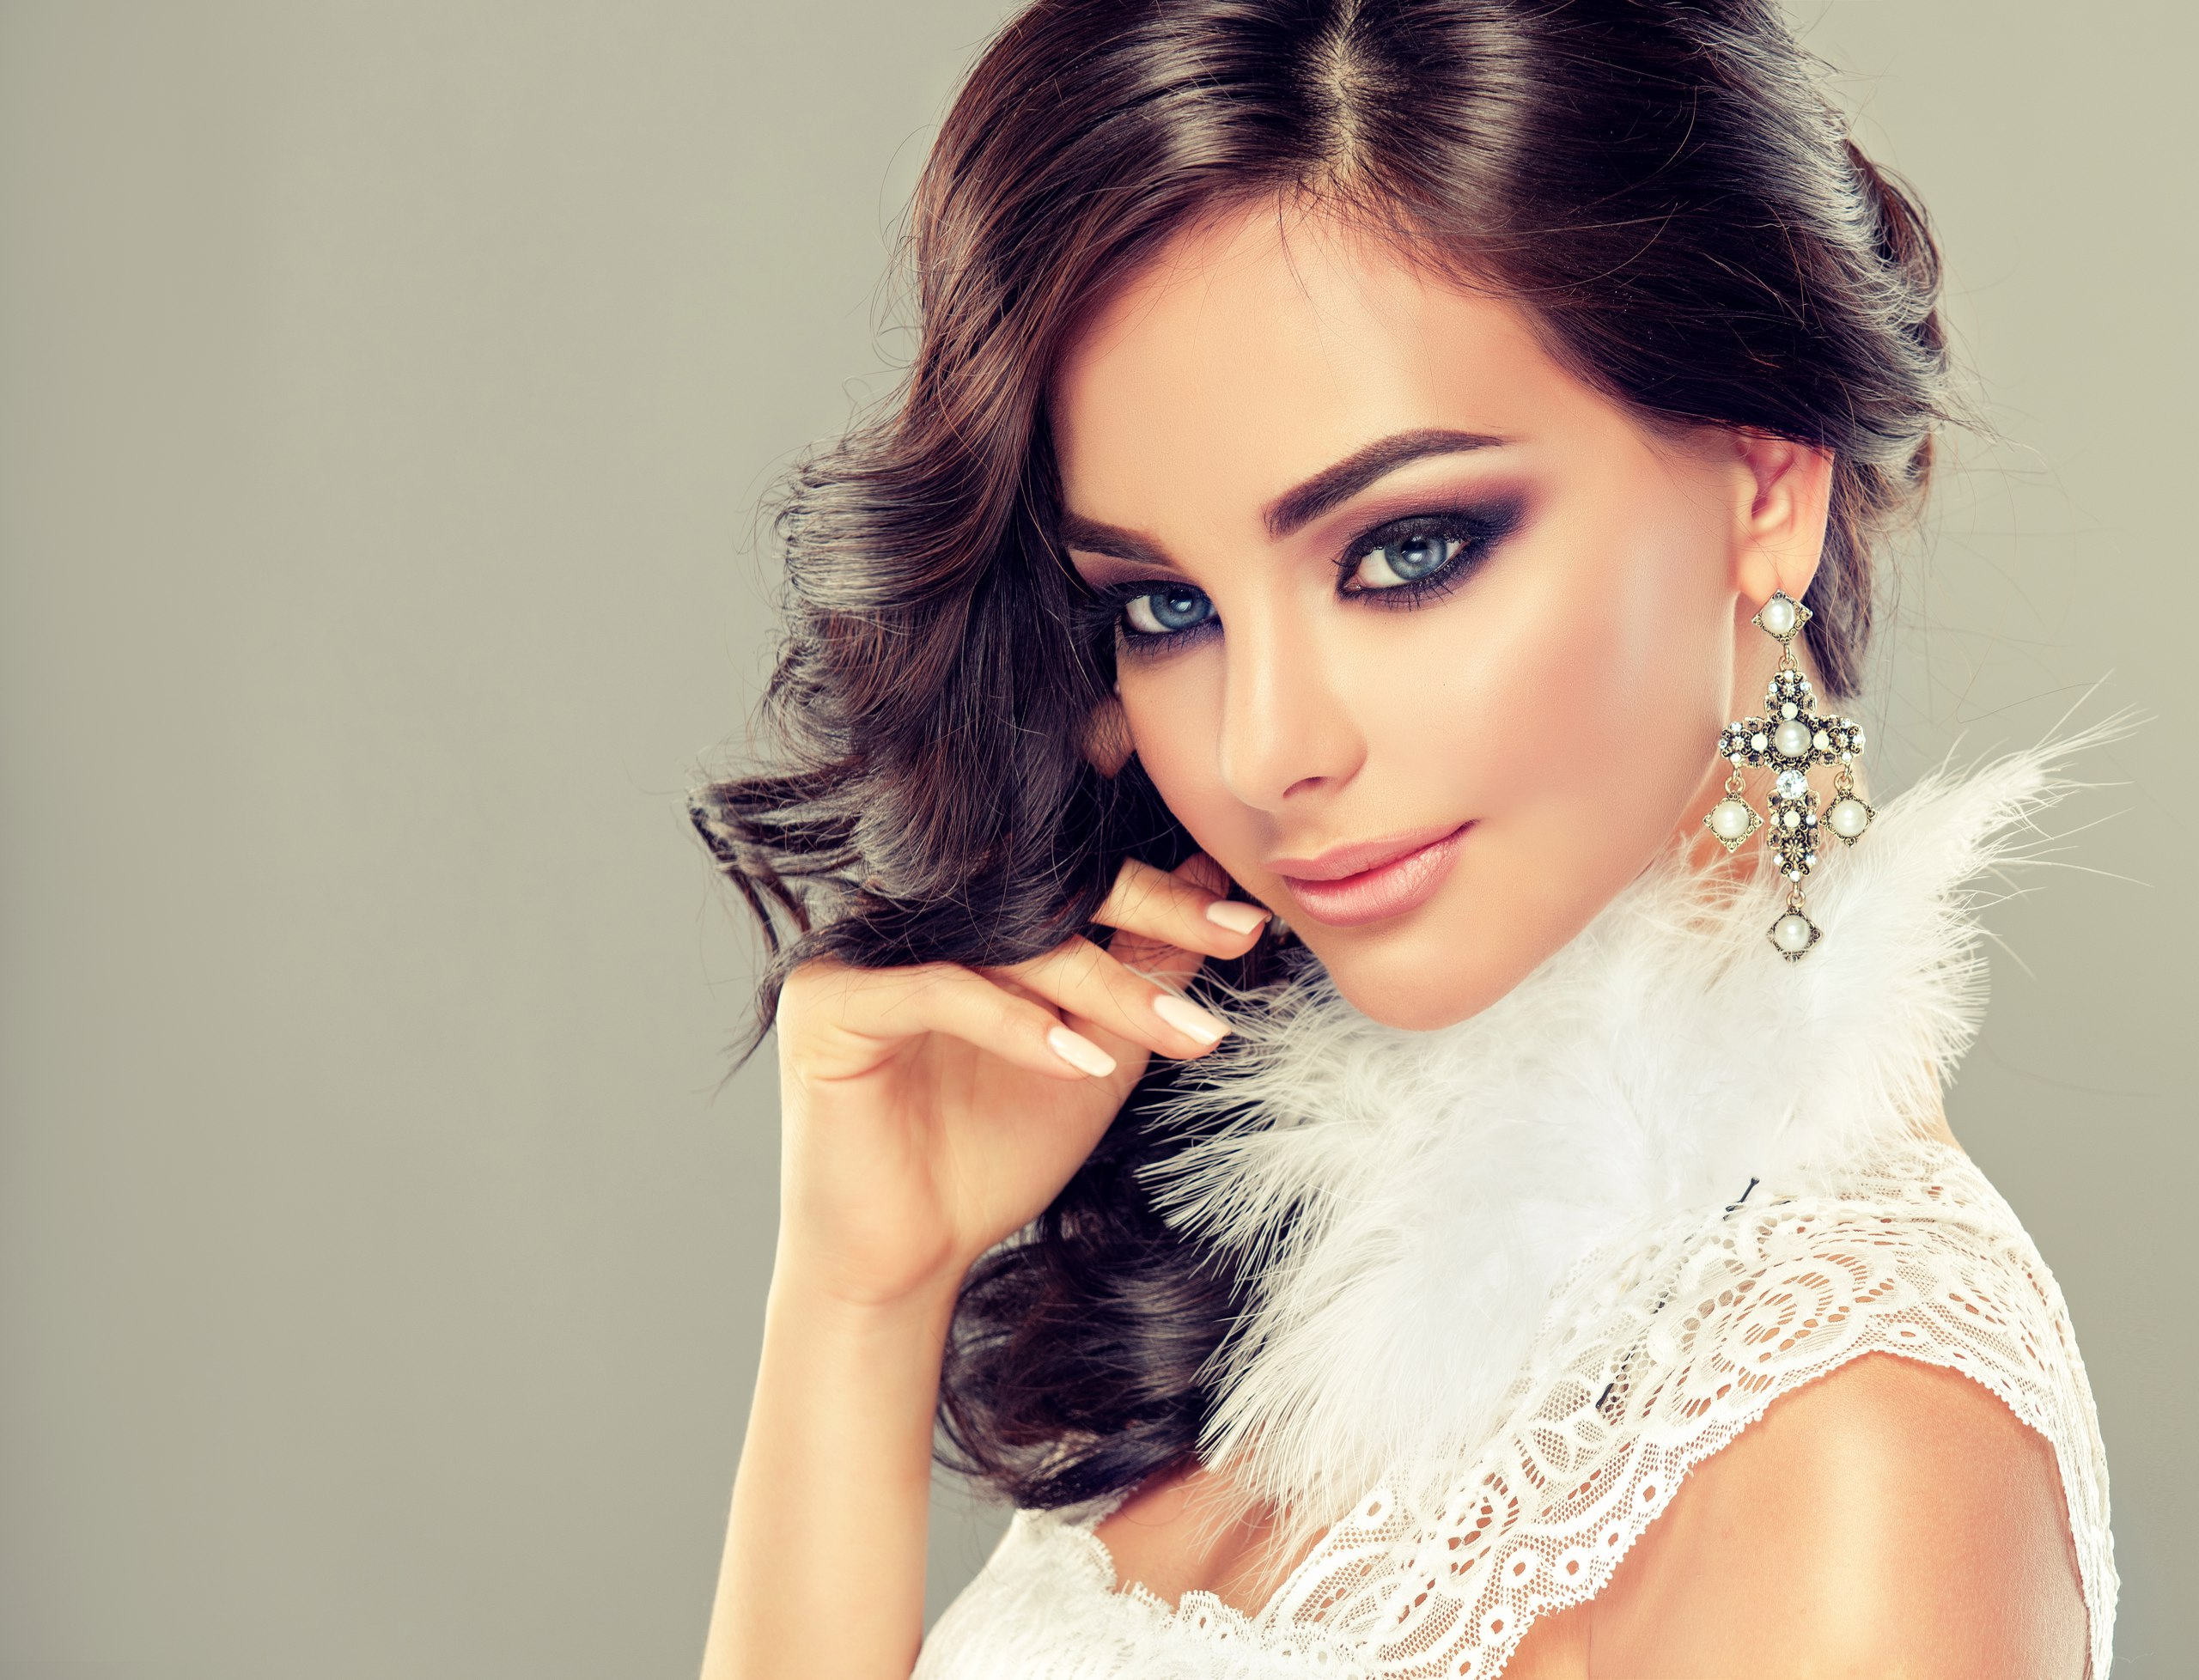 Макияж российских красавиц фото